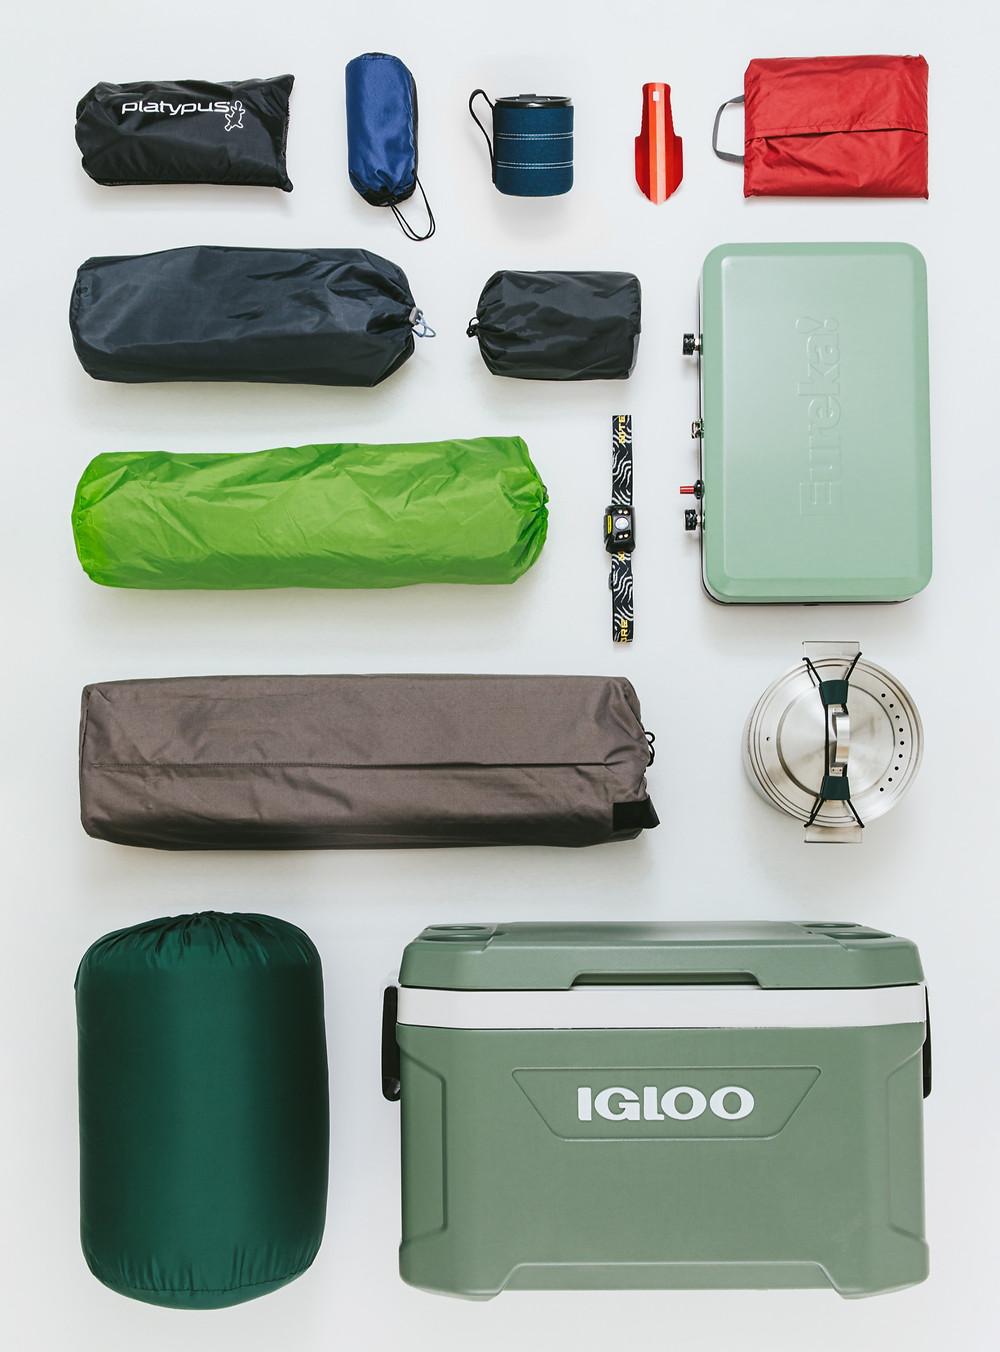 RightOnTrek car camping gear kit layout.